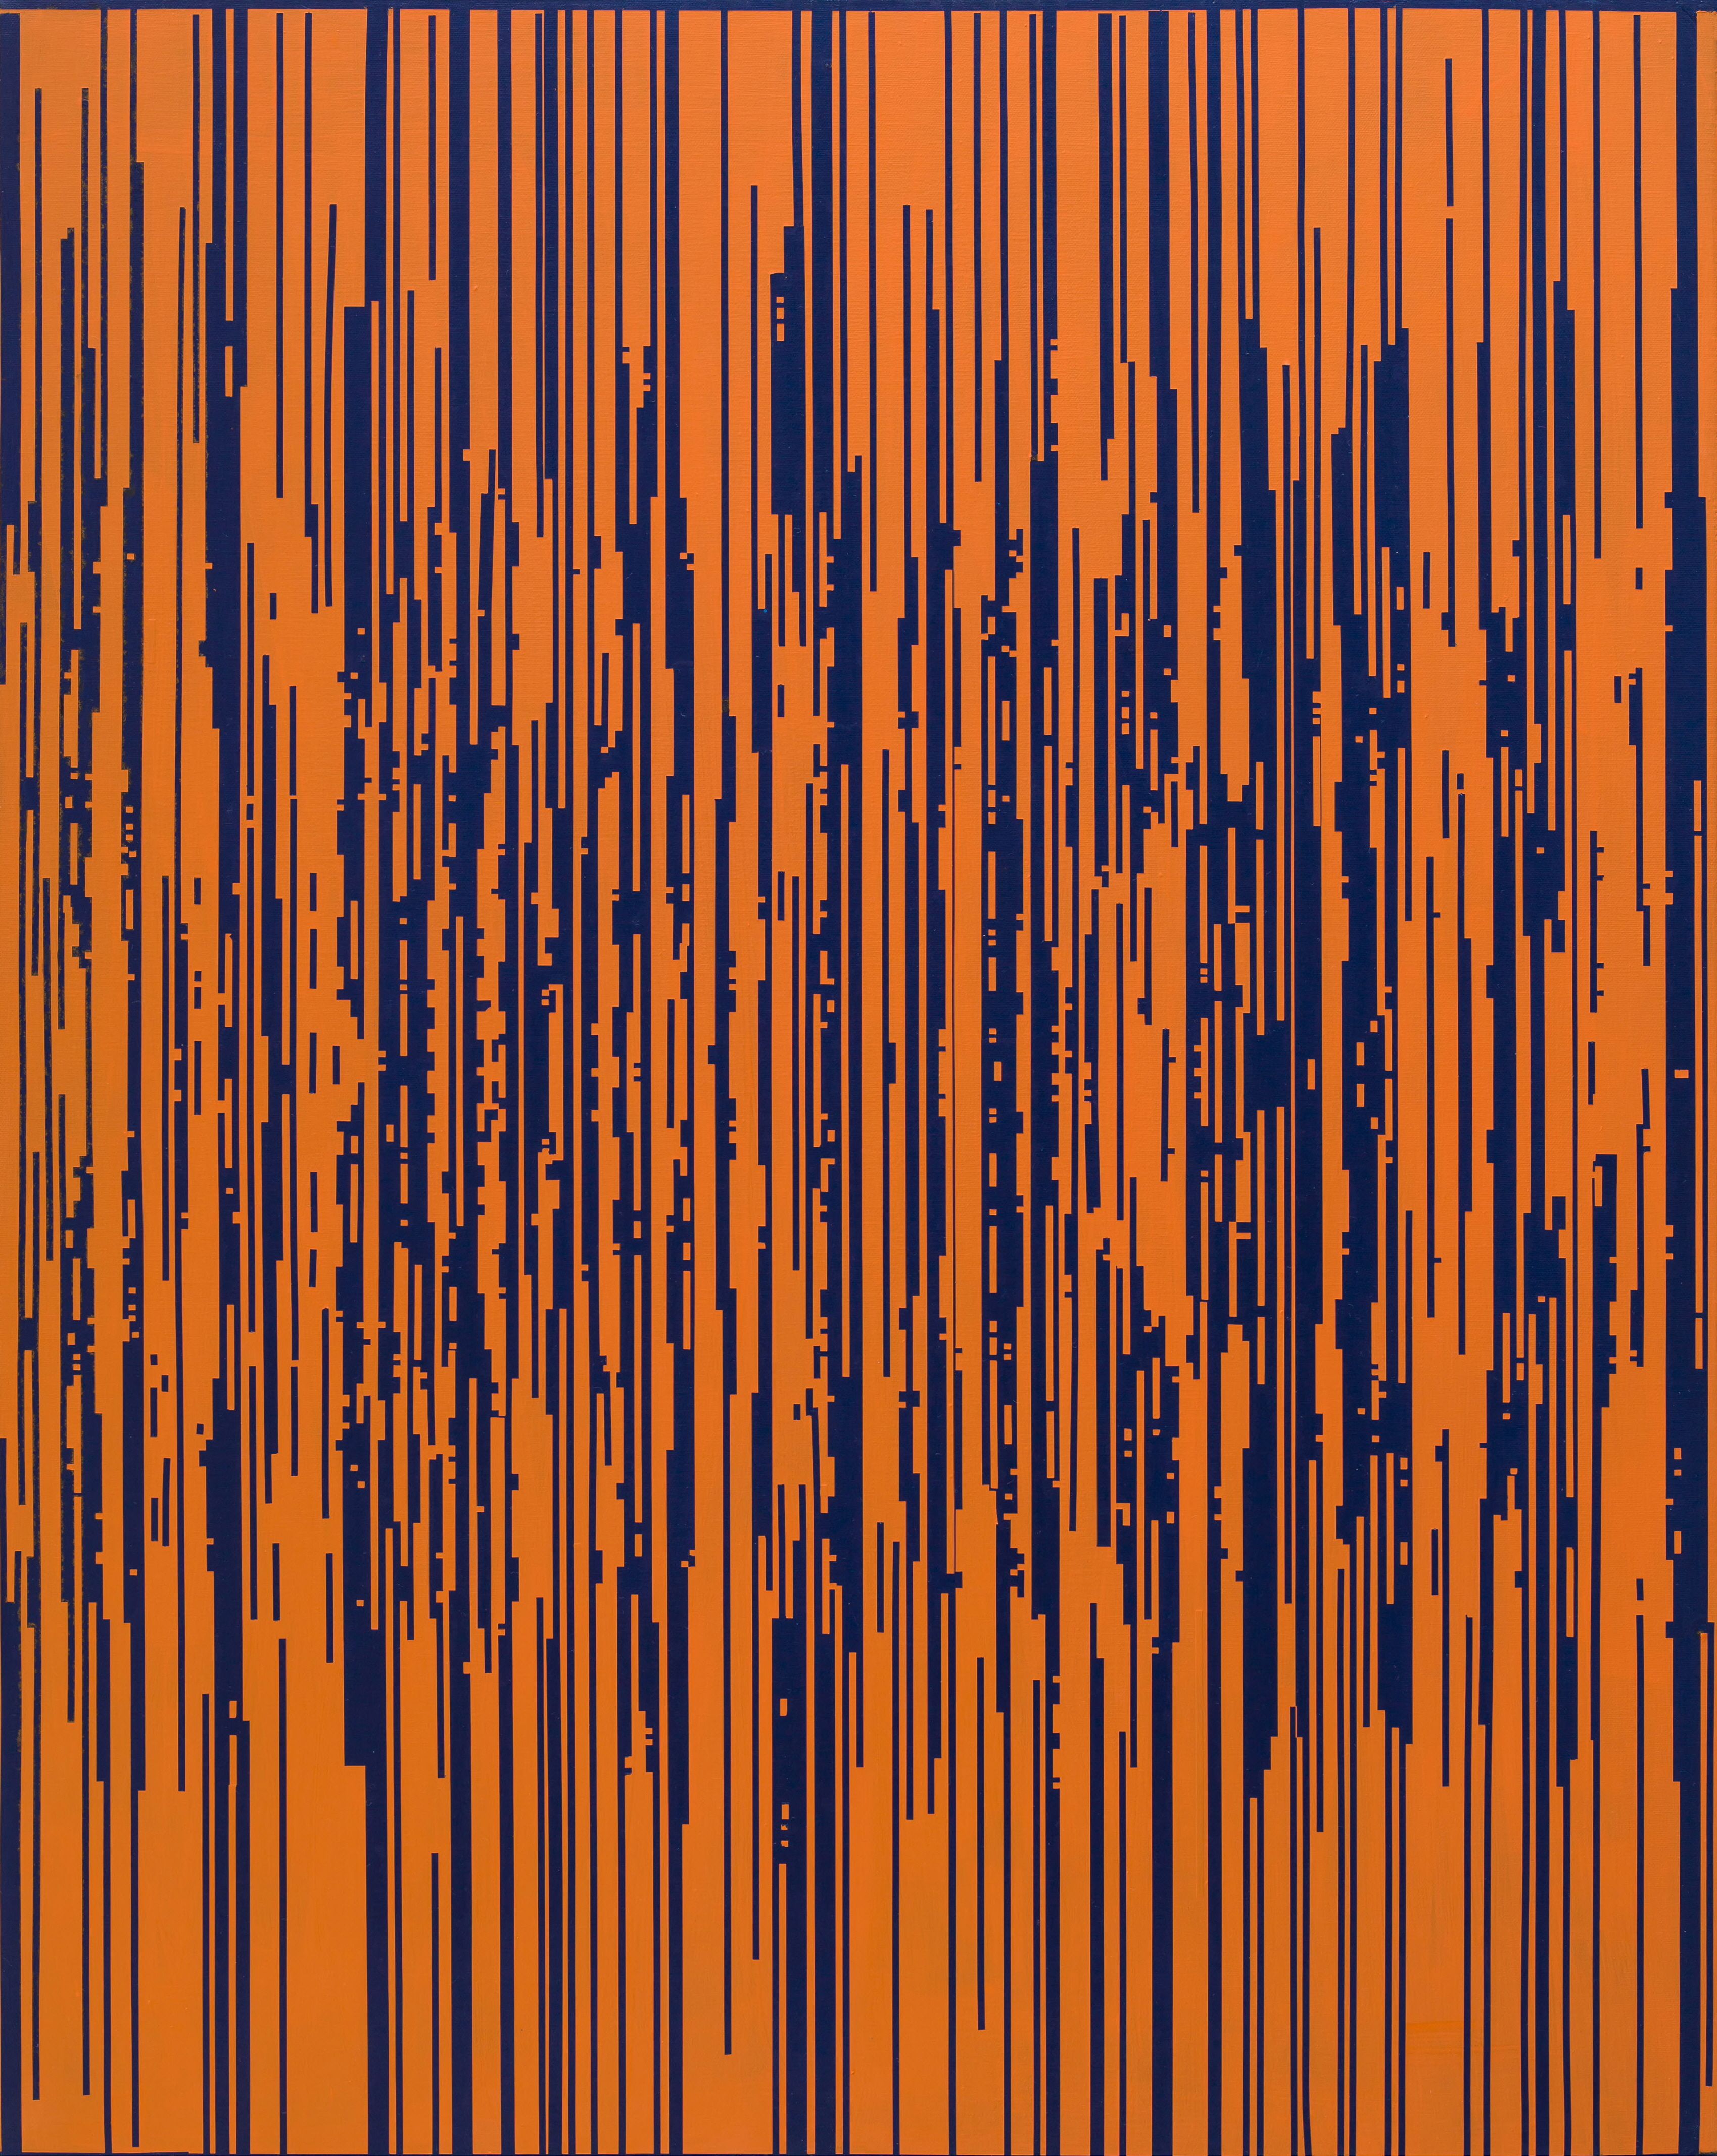 ENCODING 2015, Acrylic on canvas, 90.9 x 72.7cm (11)